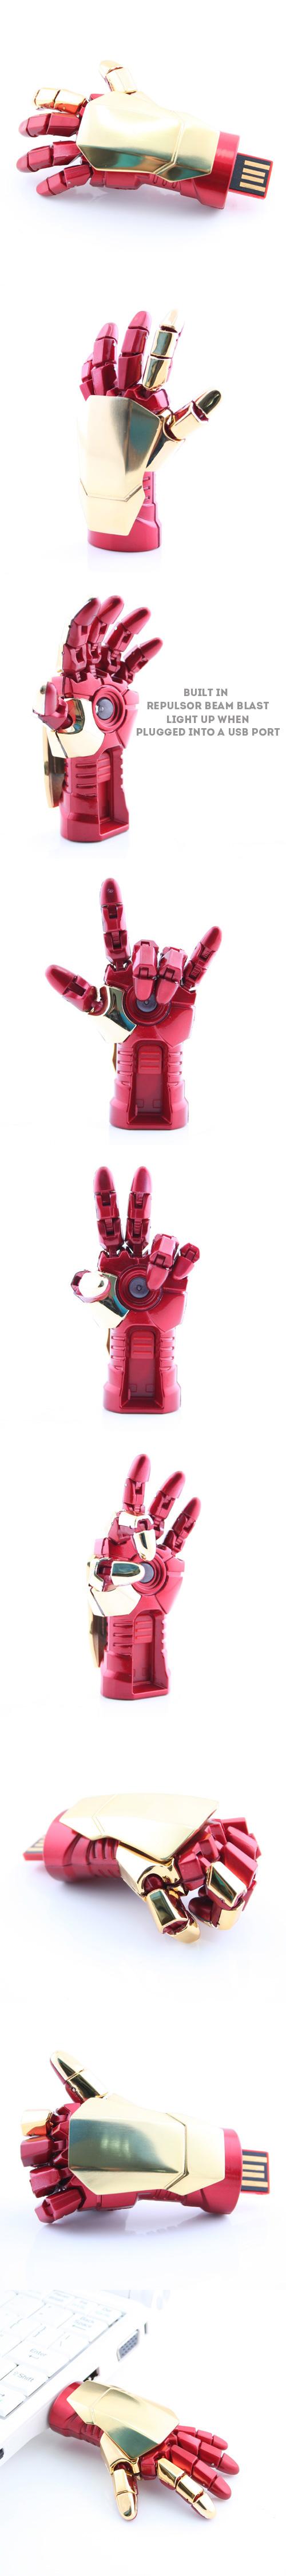 Iron Man 3 Gauntlet USB Flash Drive http://www.usbgeek.com/products/iron-man-3-gauntlet-usb-flash-drive